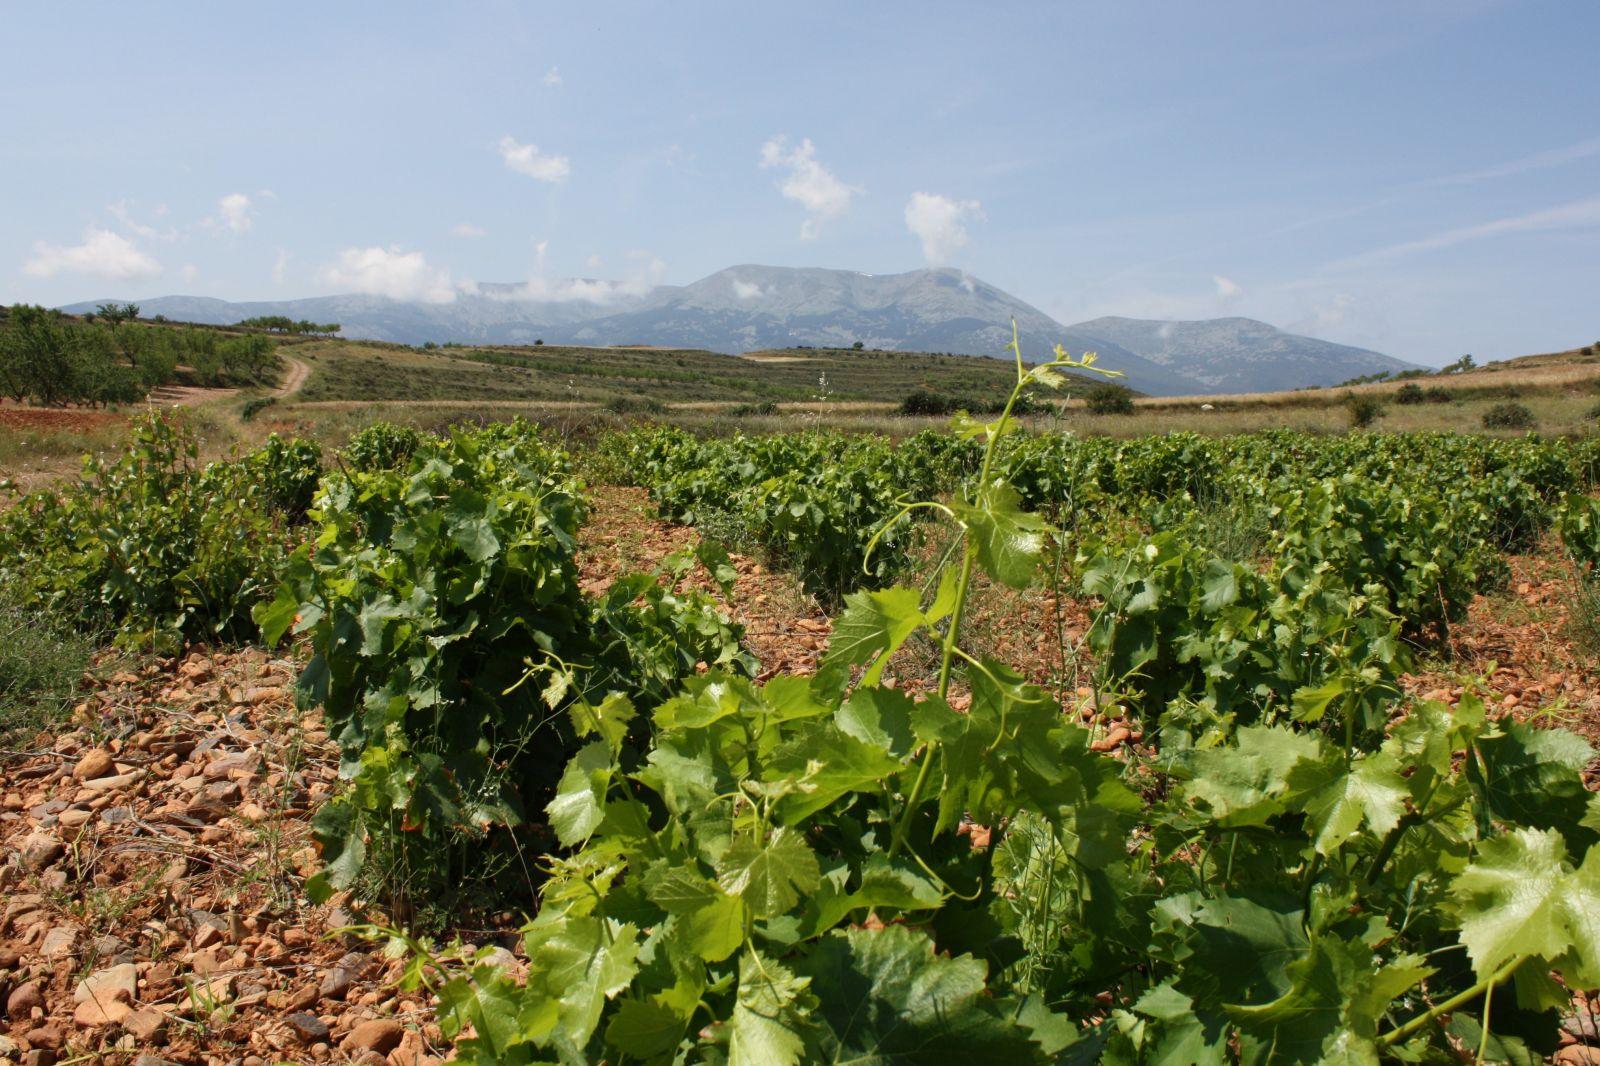 Viñedo-Vineyard Moncayo 6.JPG